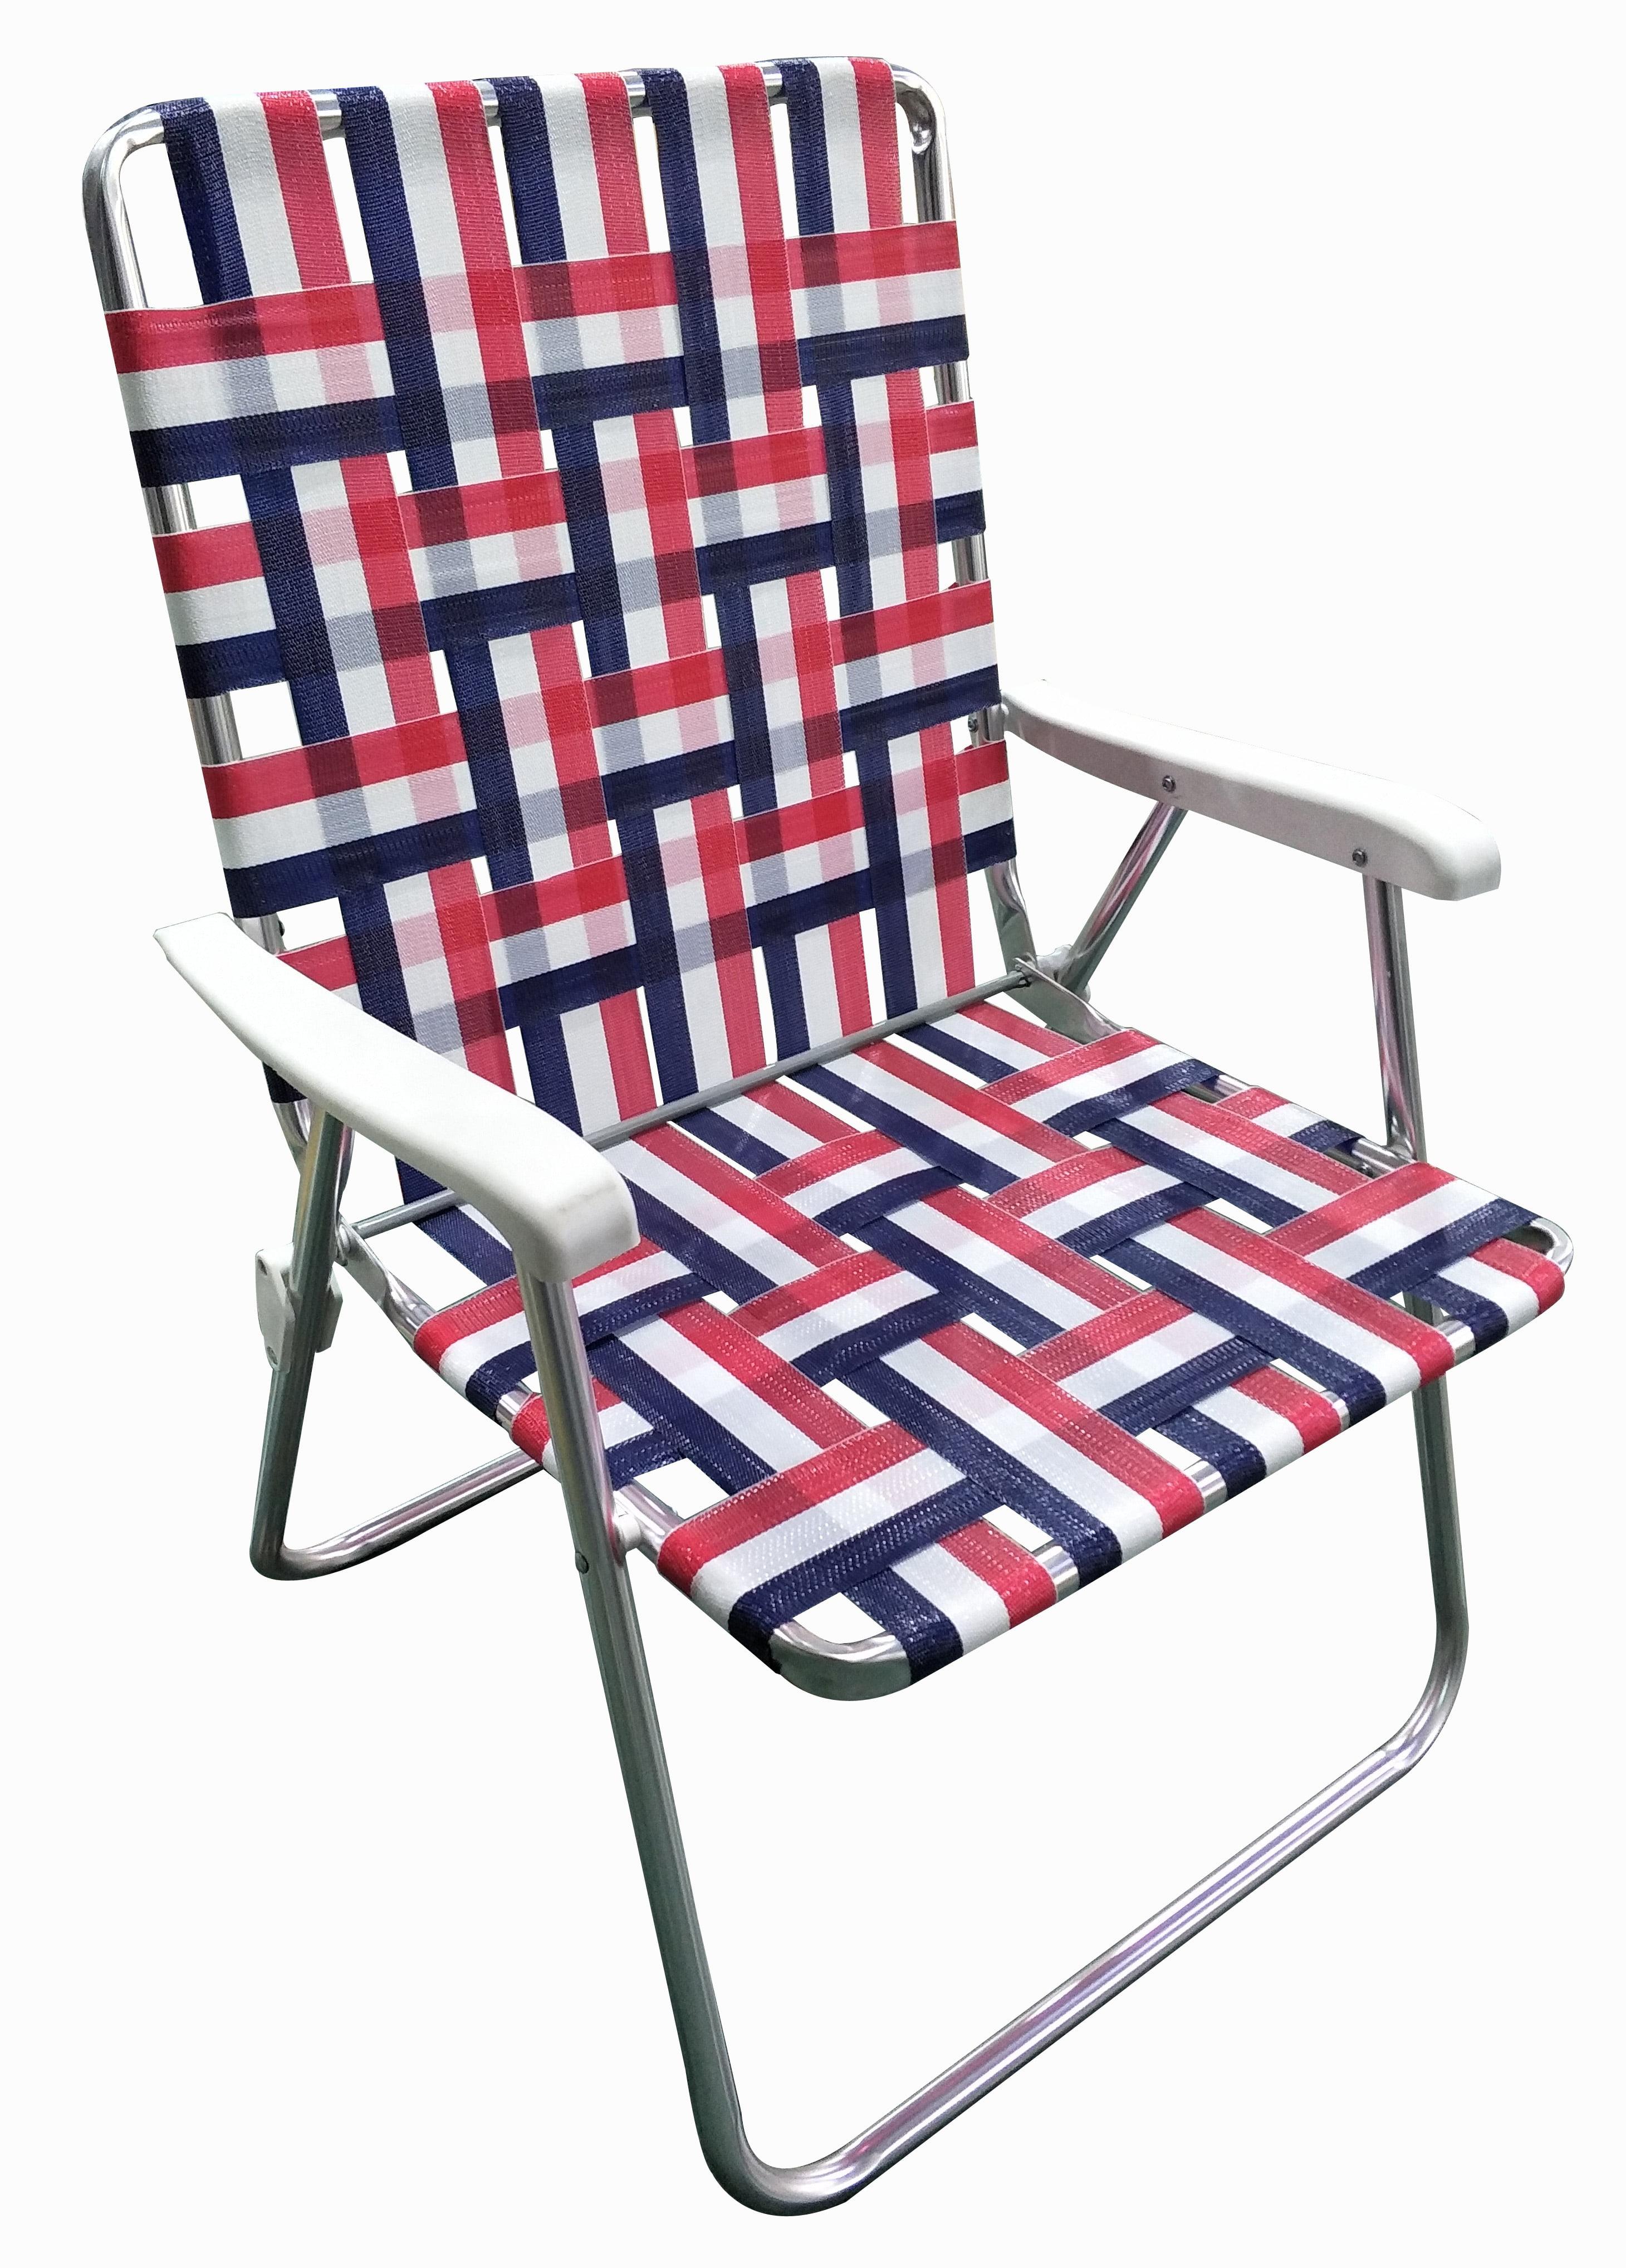 Mainstays Aluminum Web Folding Chair - Walmart.com